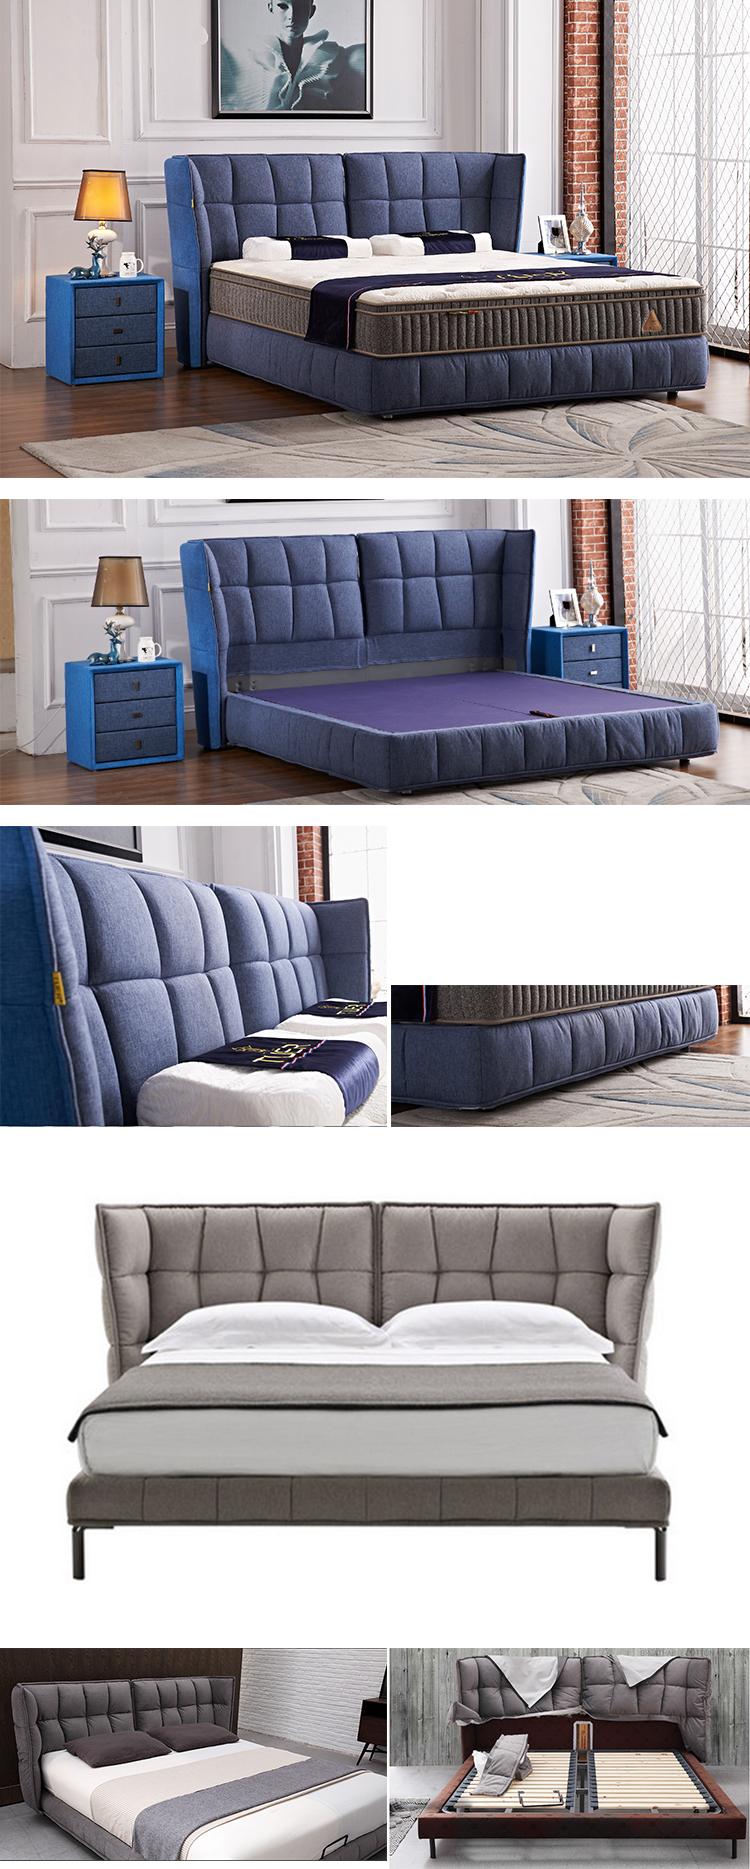 Europäischen Stil Bedbroom Möbel Diwan Bett Design Stoff König Größe ...